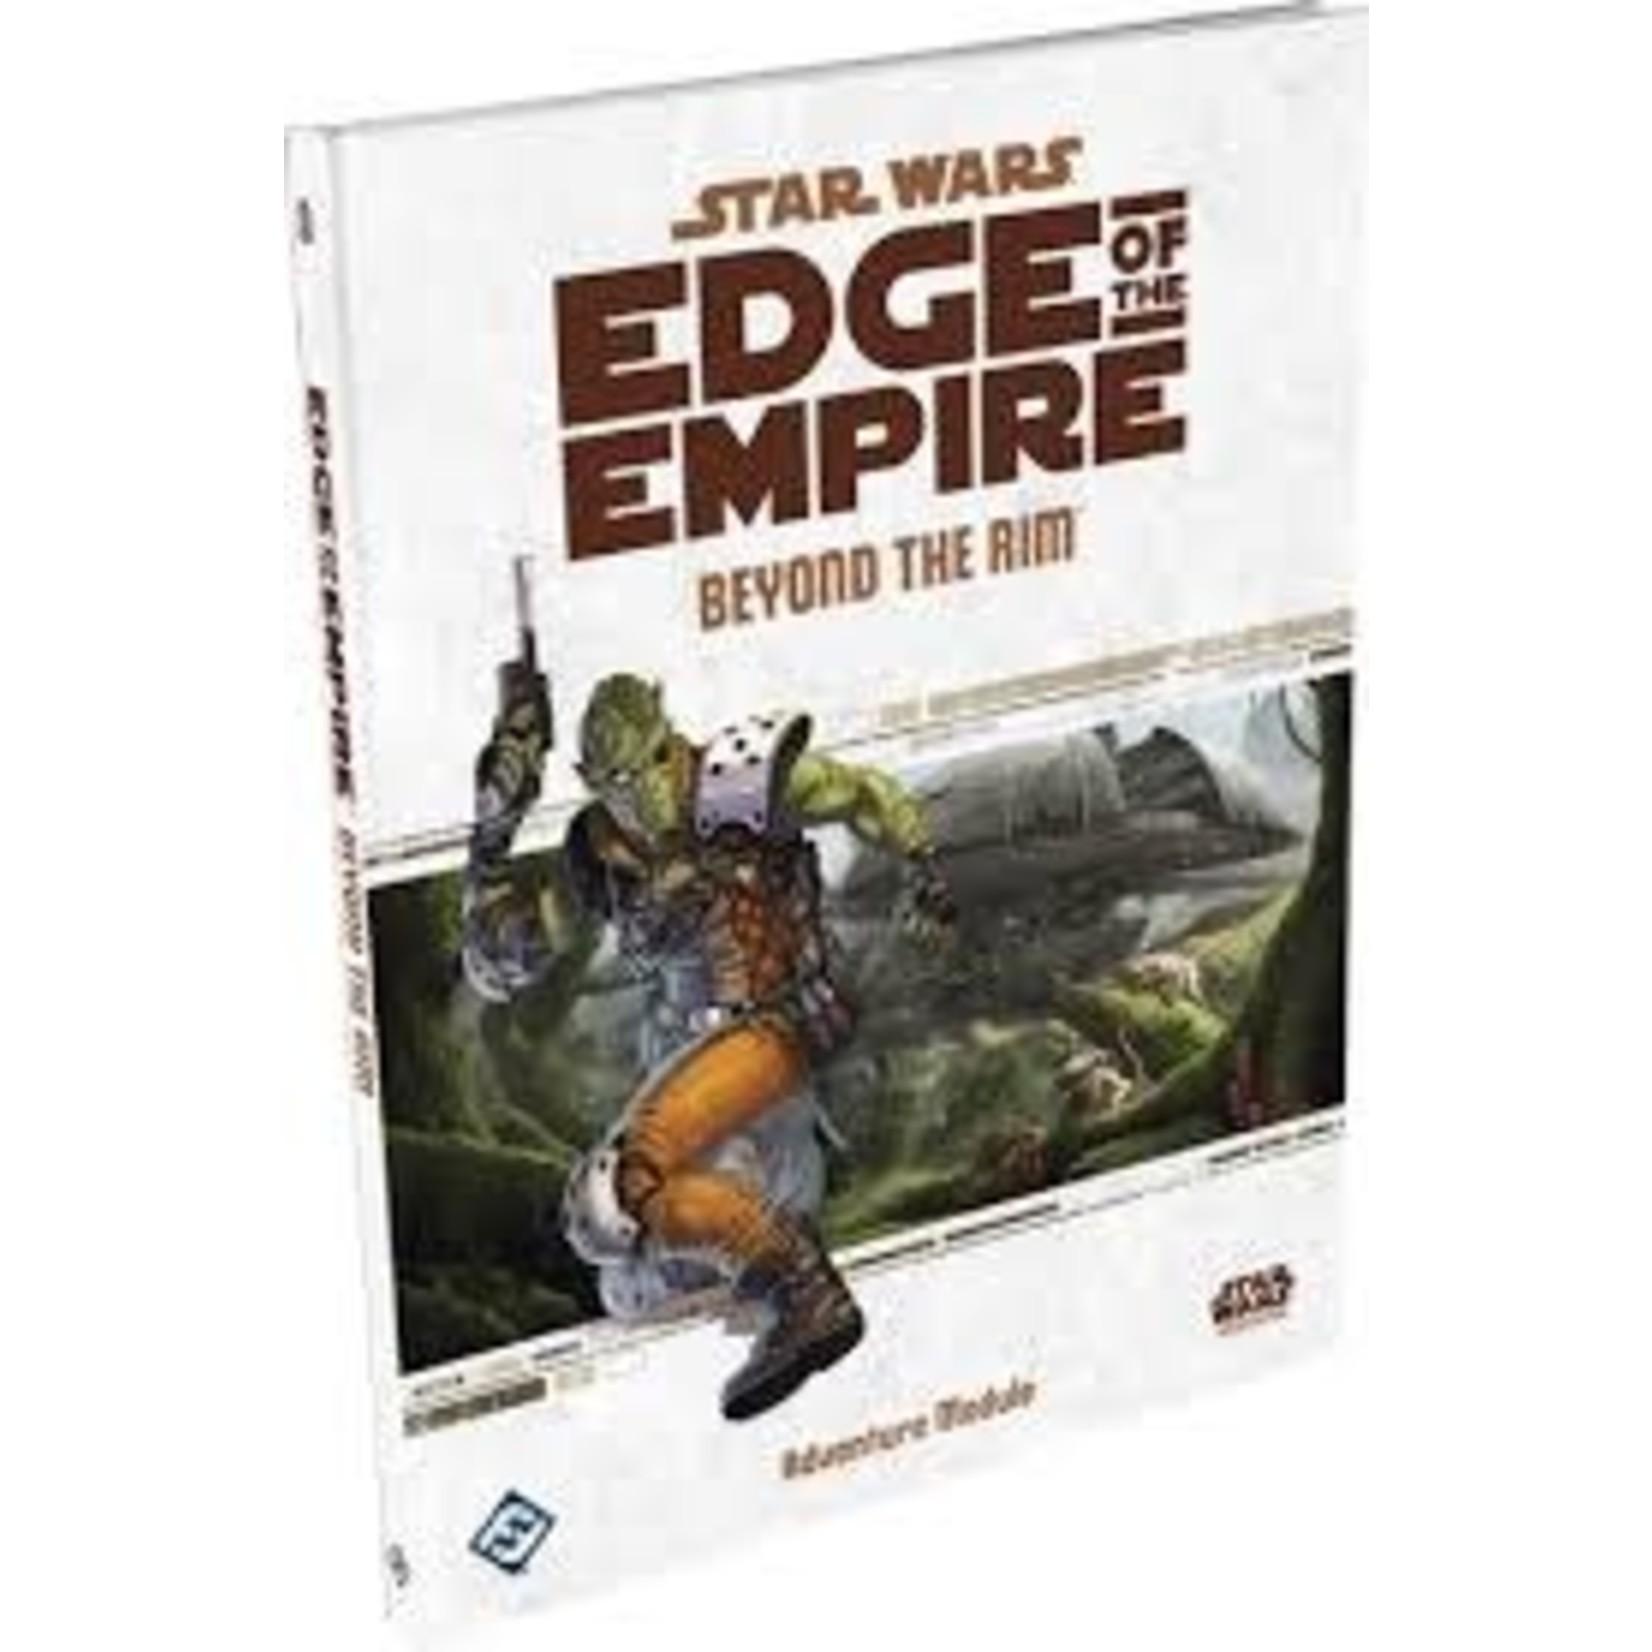 Star Wars Edge of the Empire Beyond the Rim Adventure Module